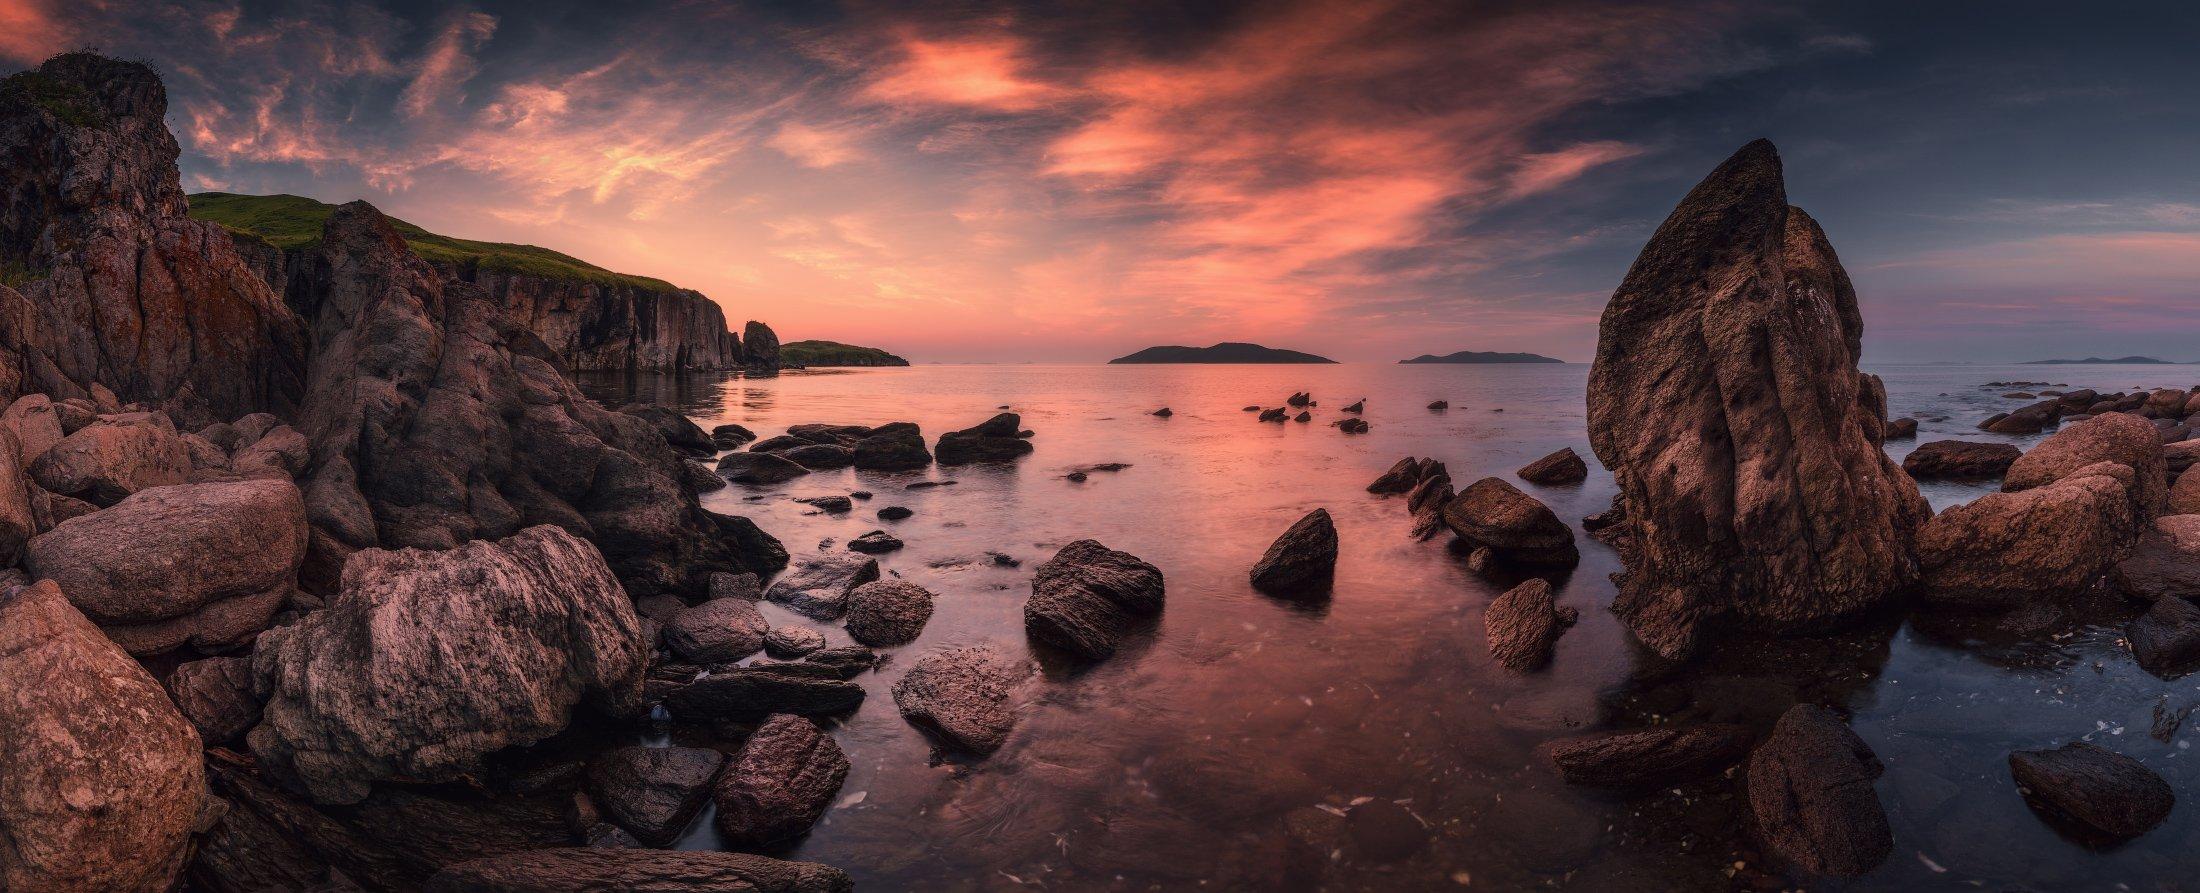 панорама, утро, море, скалы, камни, Андрей Кровлин